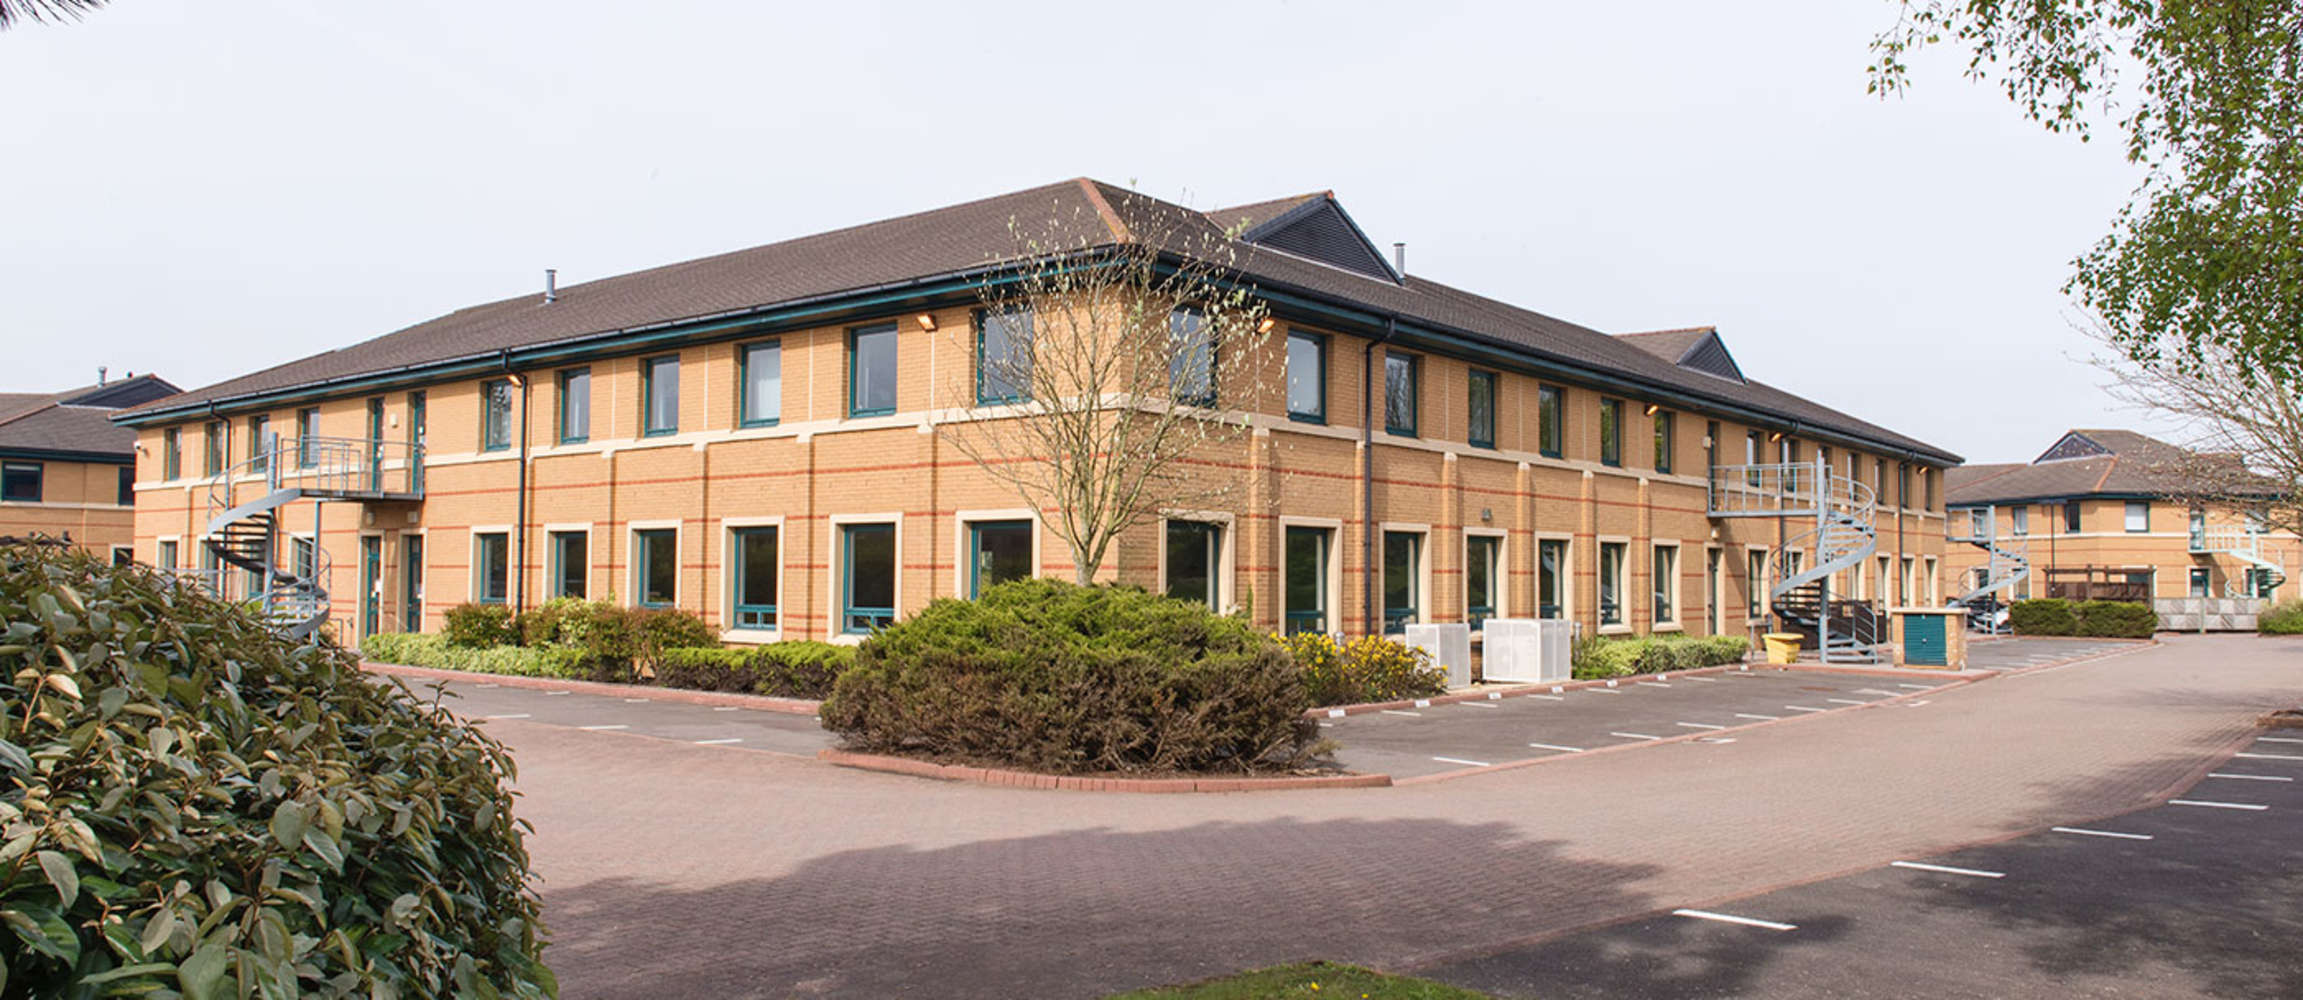 Office Birmingham, B37 7YE - 2675 Kings Court, Birmingham Business Park - 3